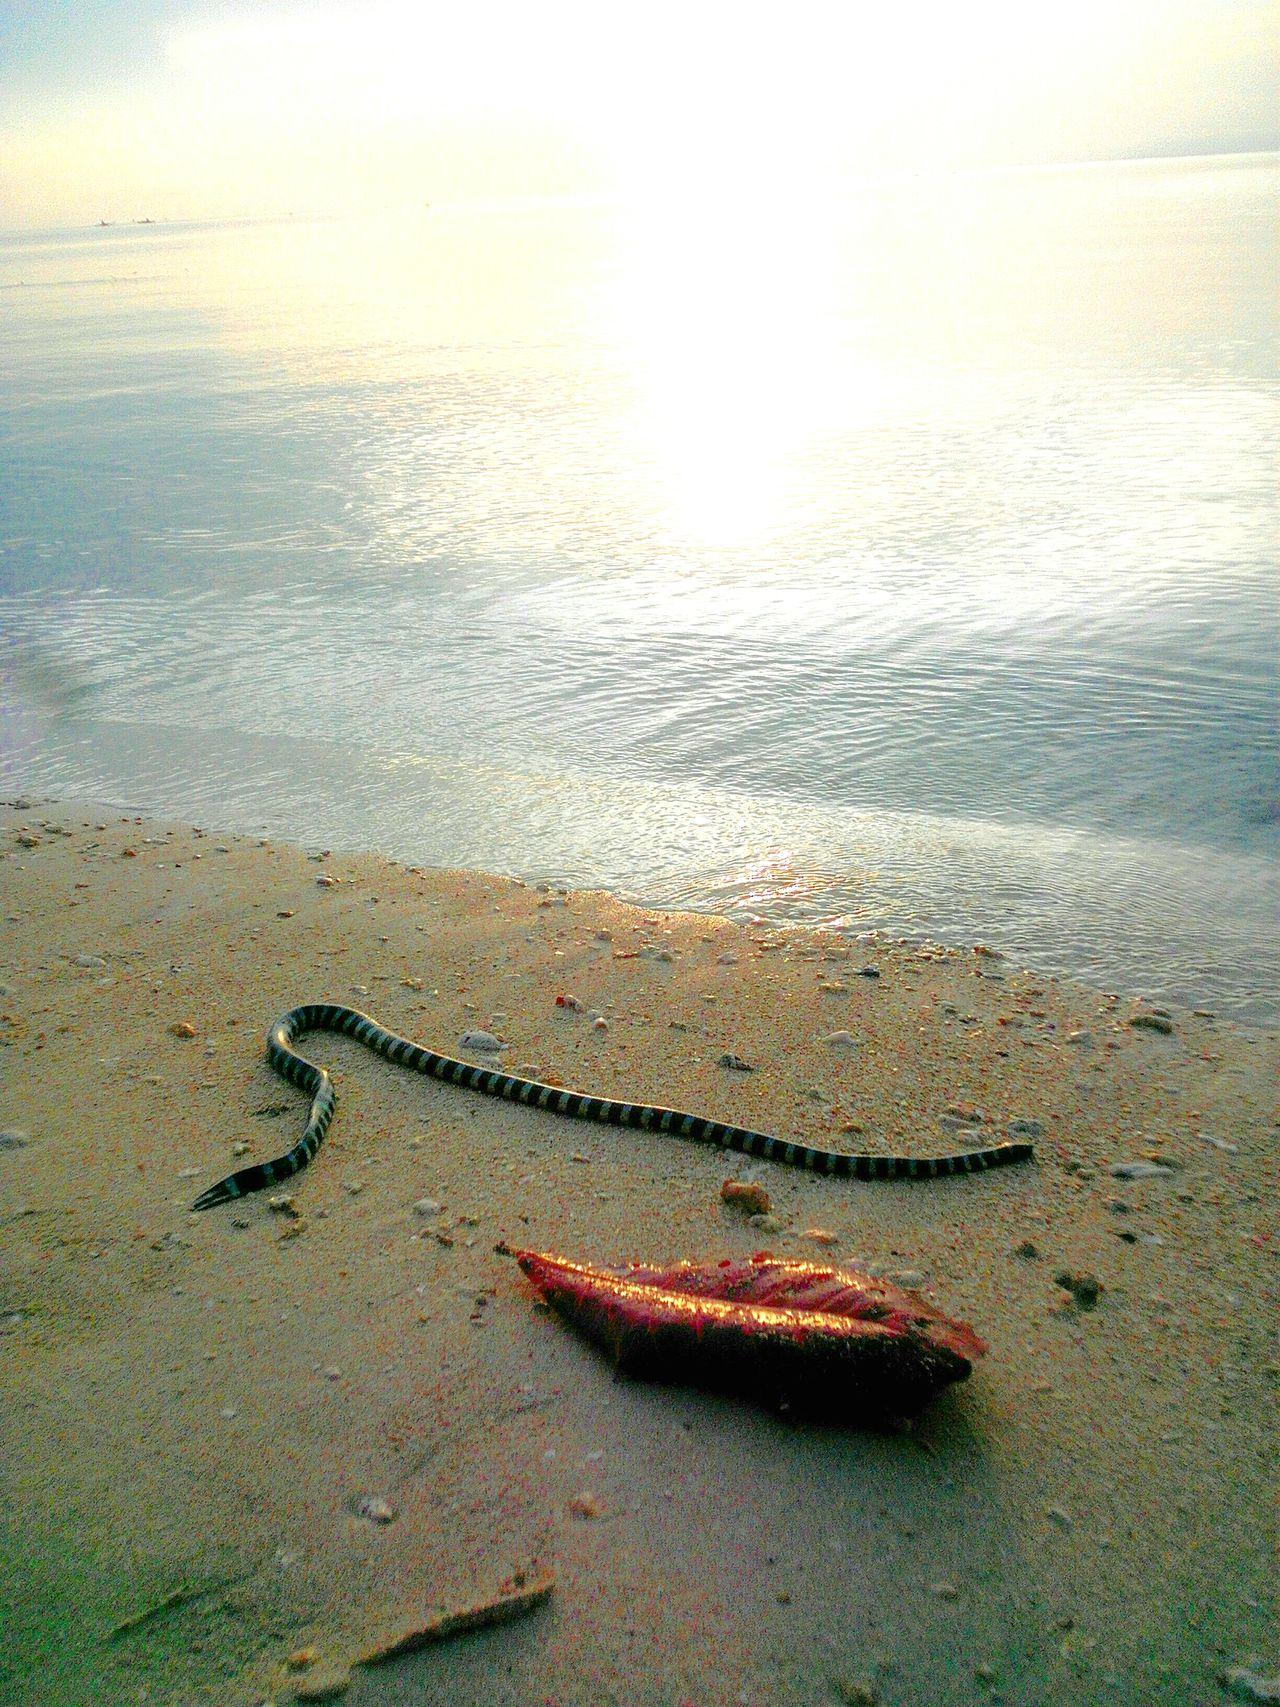 Even snakes relax at beach.. 😇😇😇 Relaxing Beach Seasnakes Enjoying Life